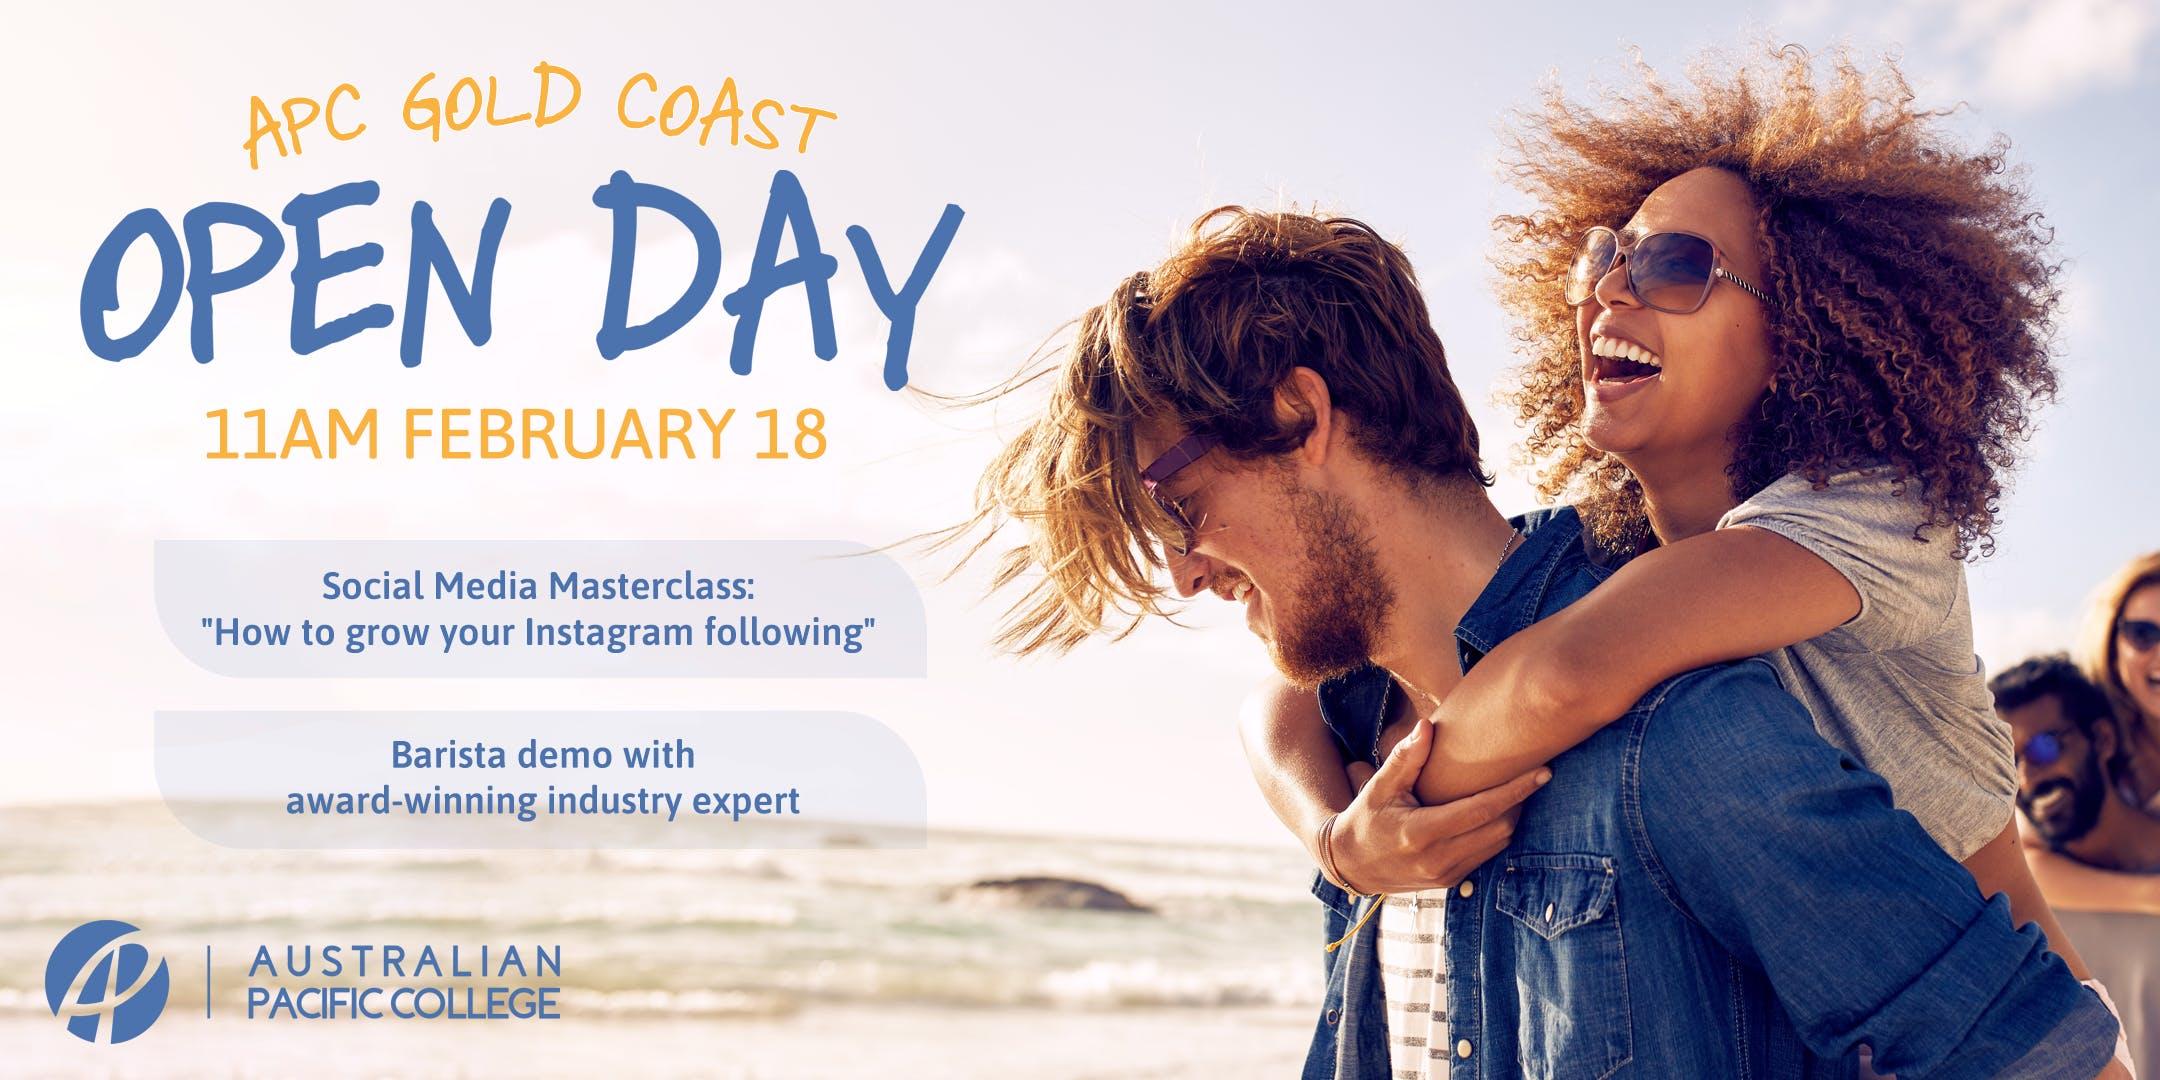 APC Gold Coast Open Day!